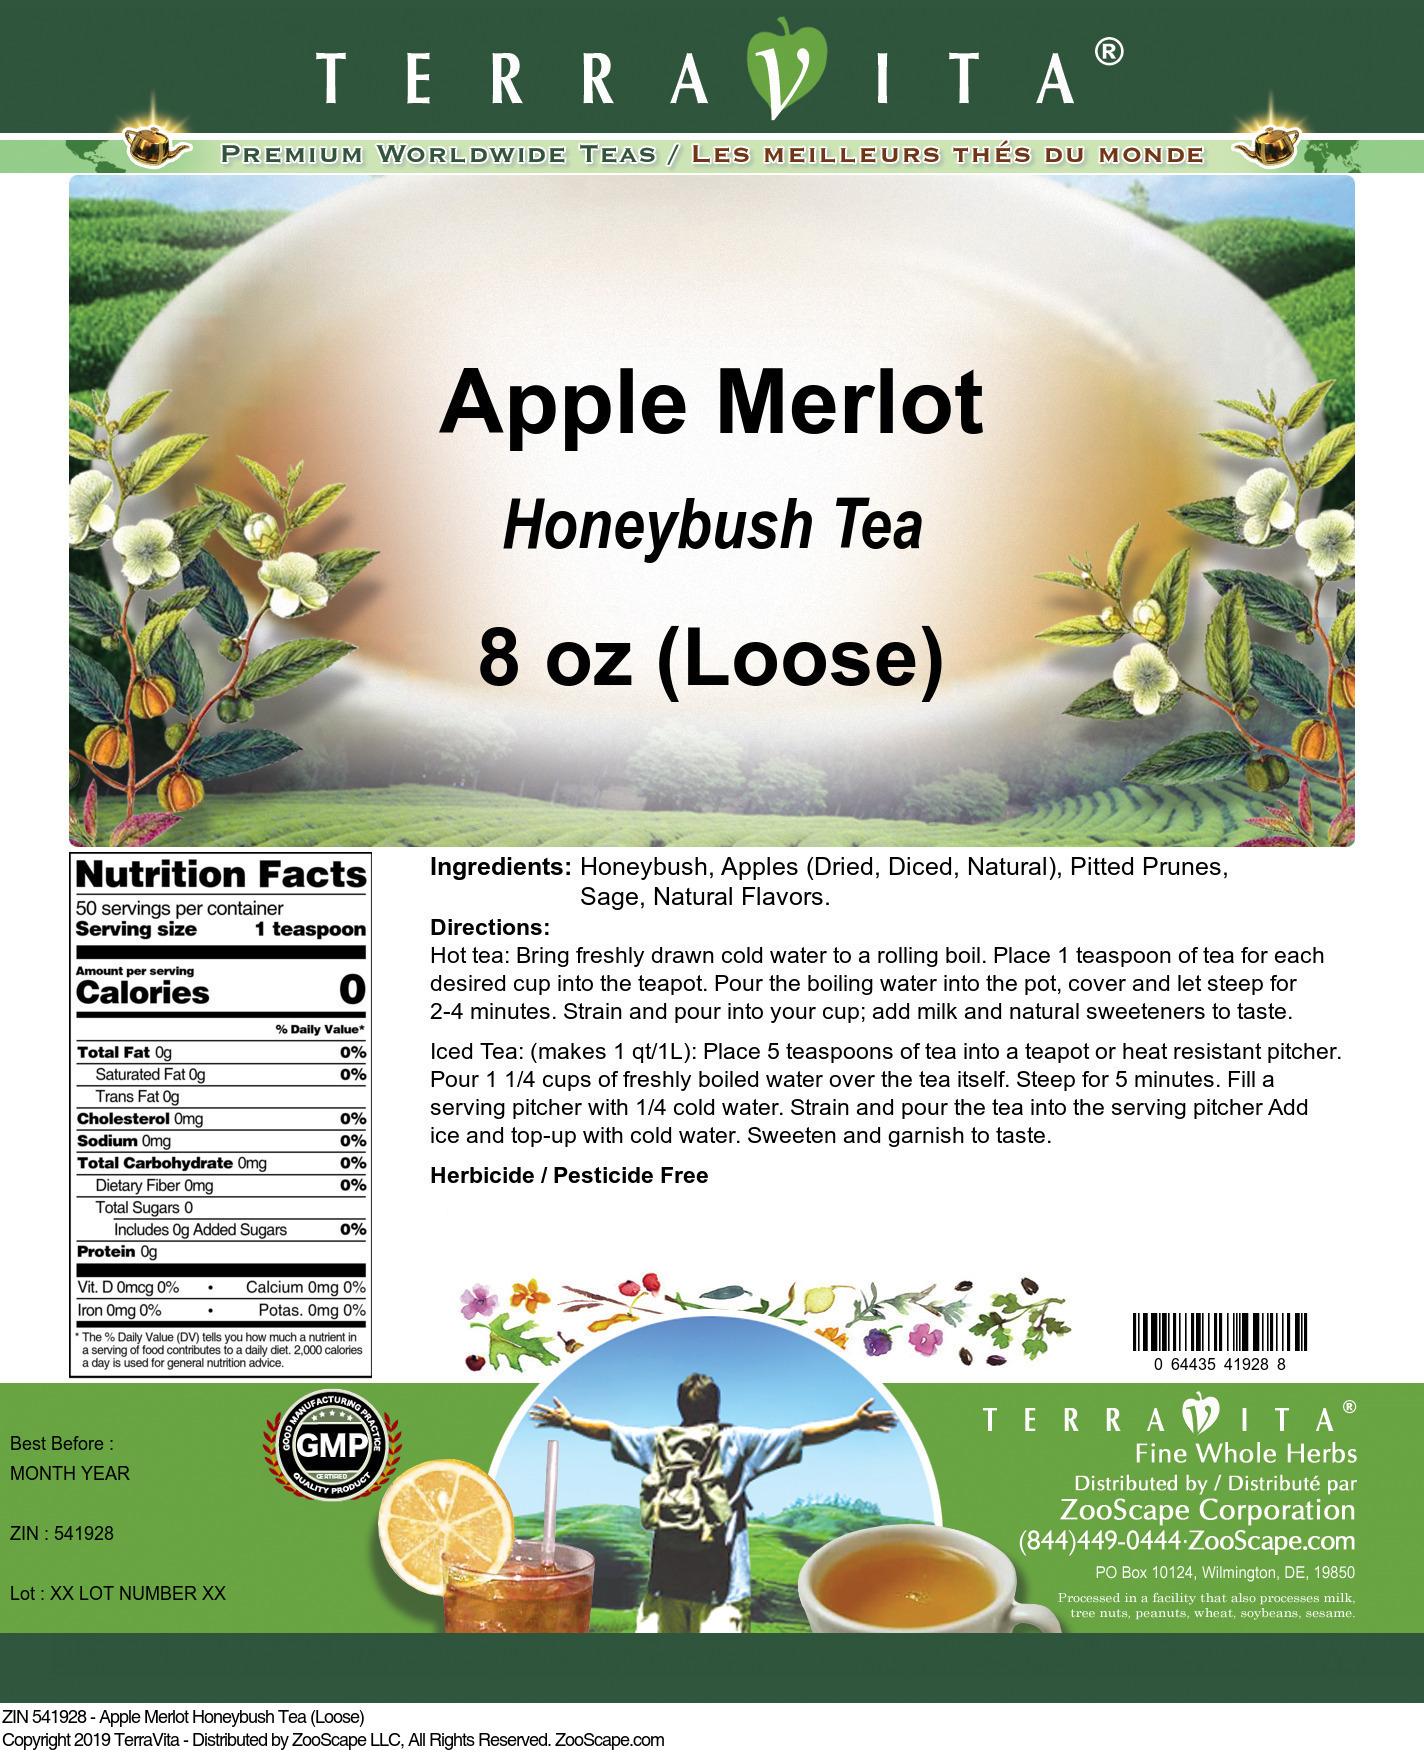 Apple Merlot Honeybush Tea